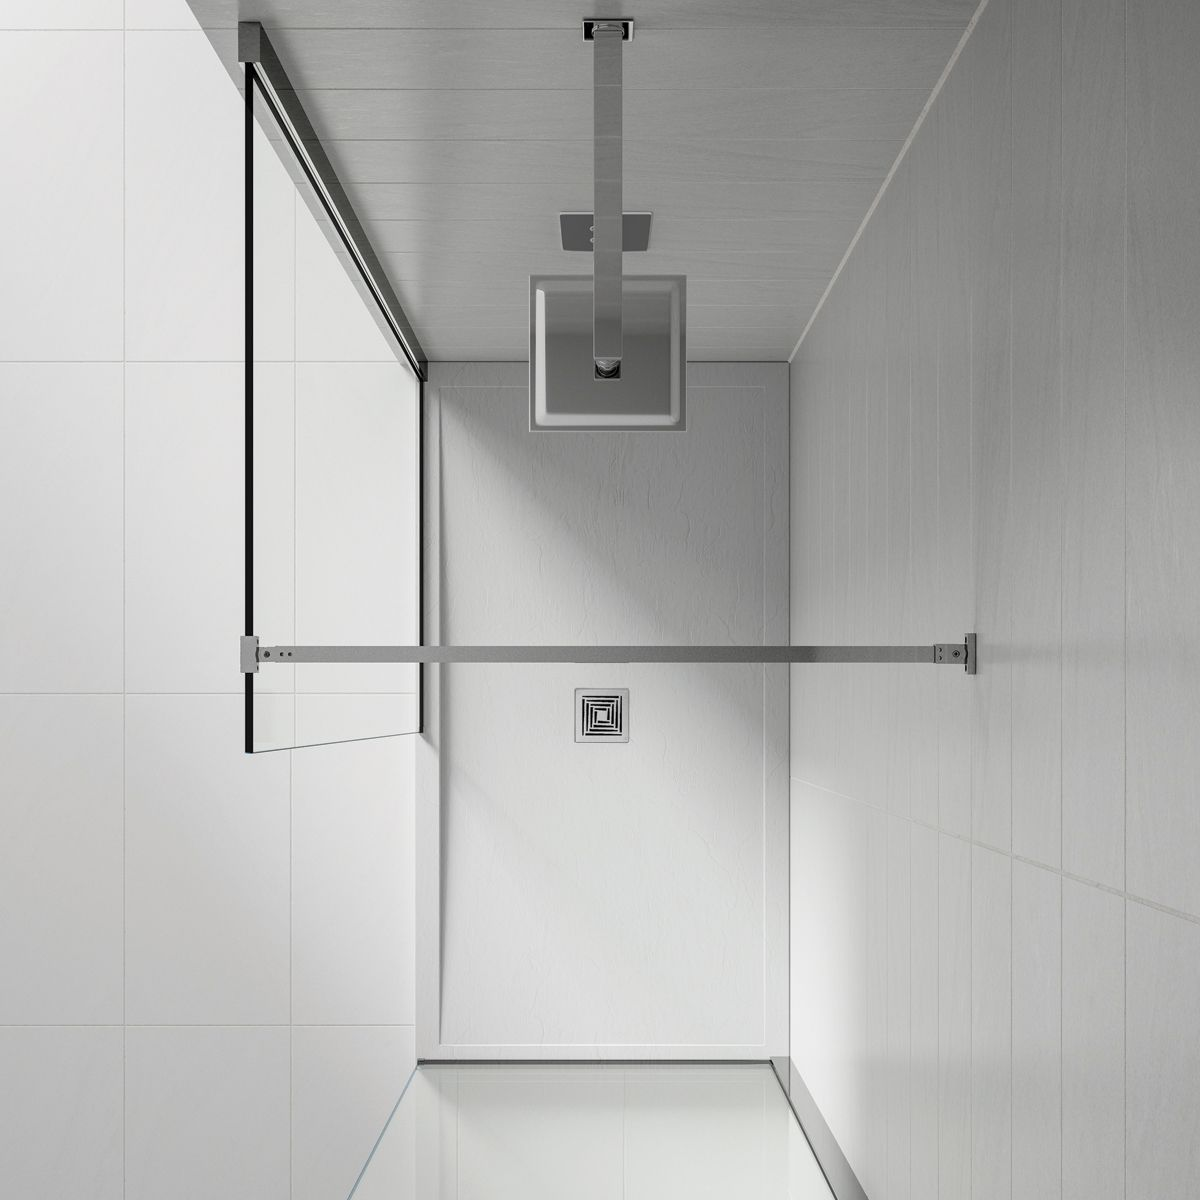 Aquadart White Slate Shower Tray 1500 x 760 Overhead